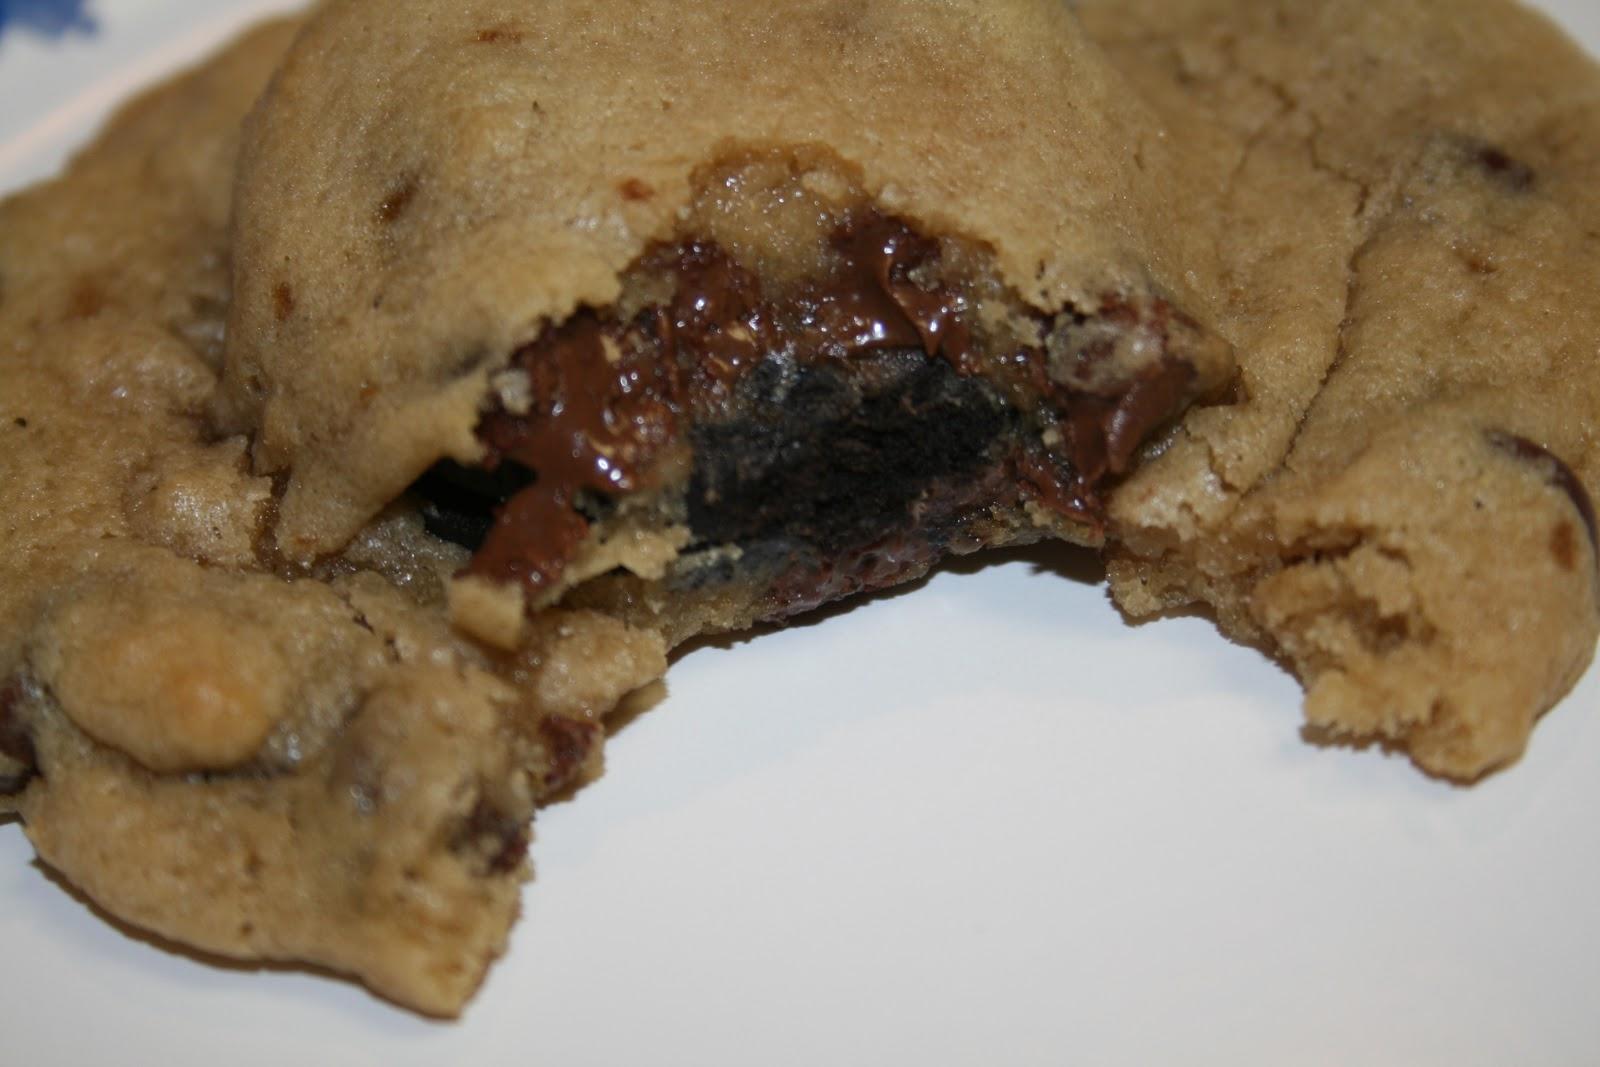 Lola's Homemade Cooking: Oreo Stuffed Chocolate Chip Cookies